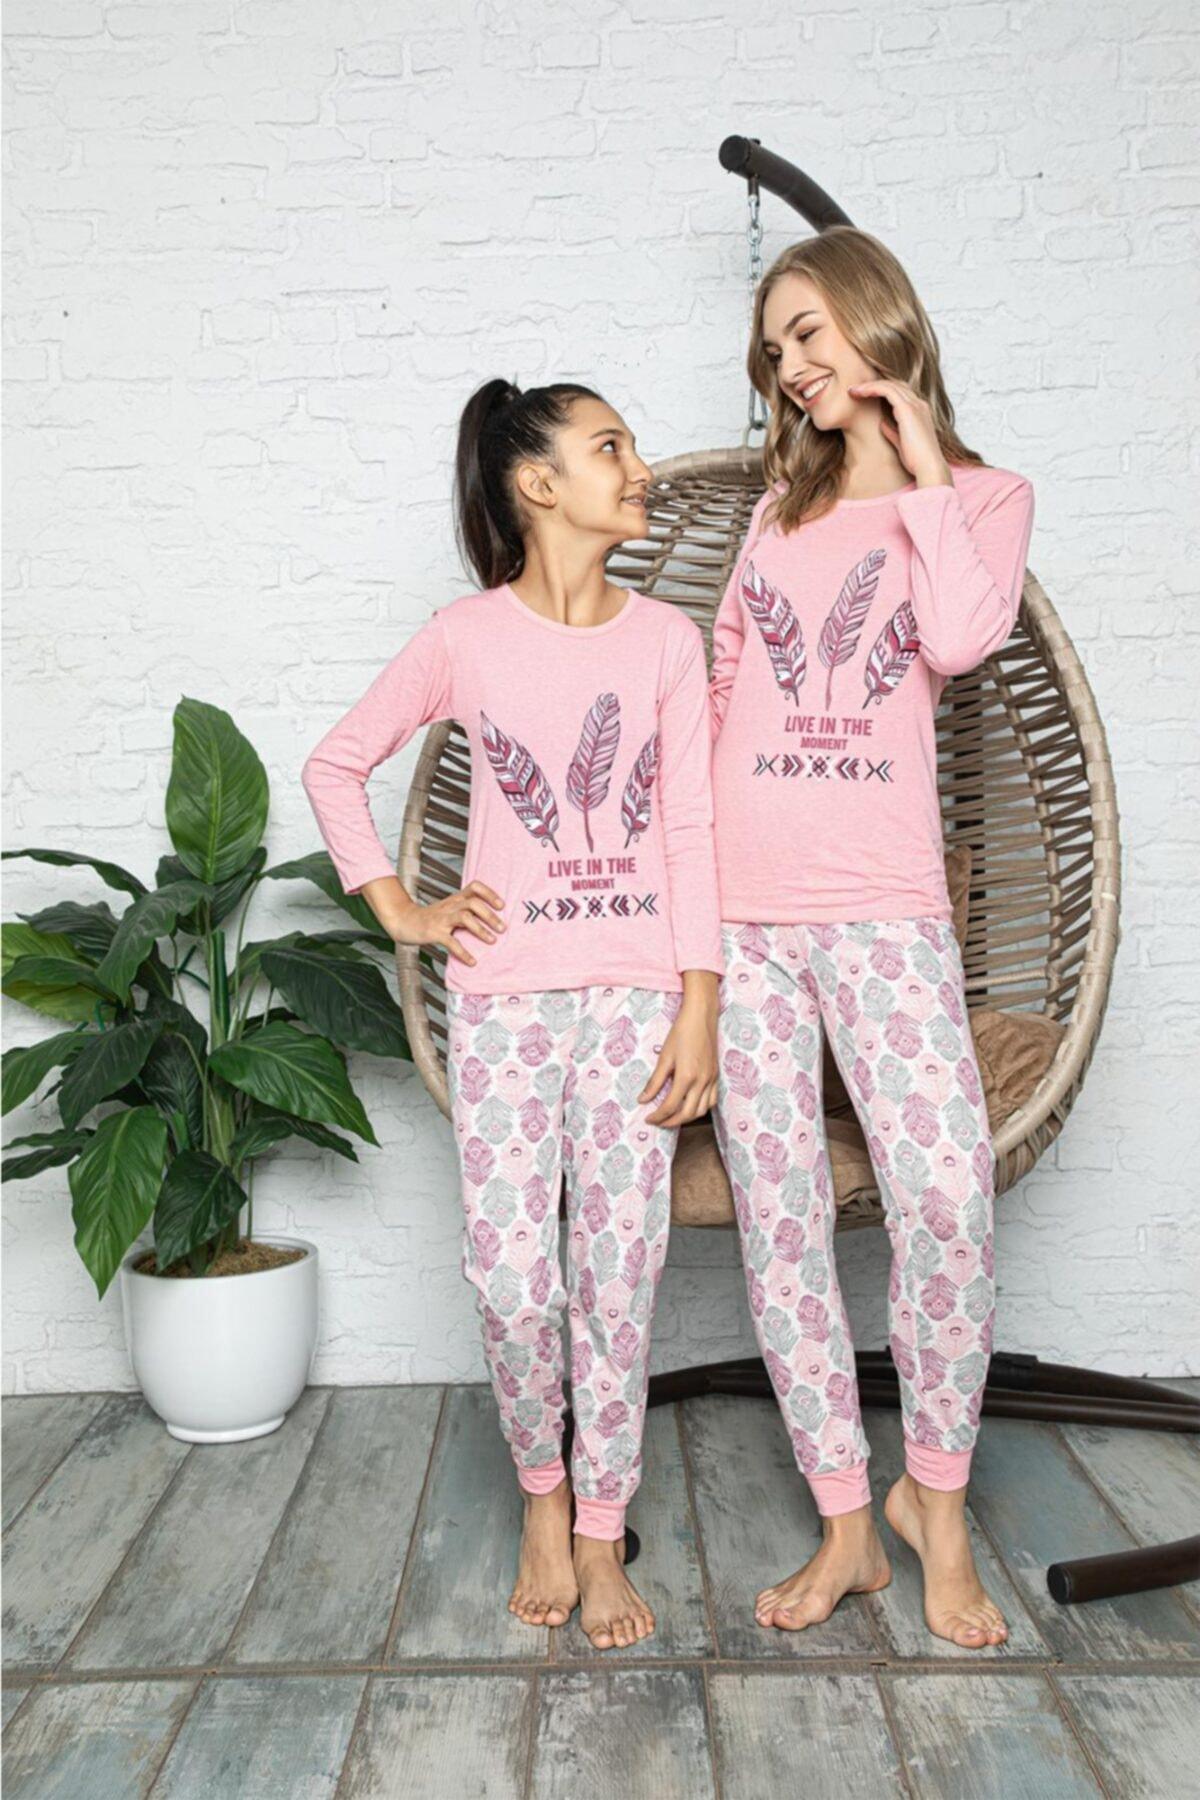 Souffle Boutique Kuş Tüyü Baskılı Pembe Anne Kız Pijama Takımı 1